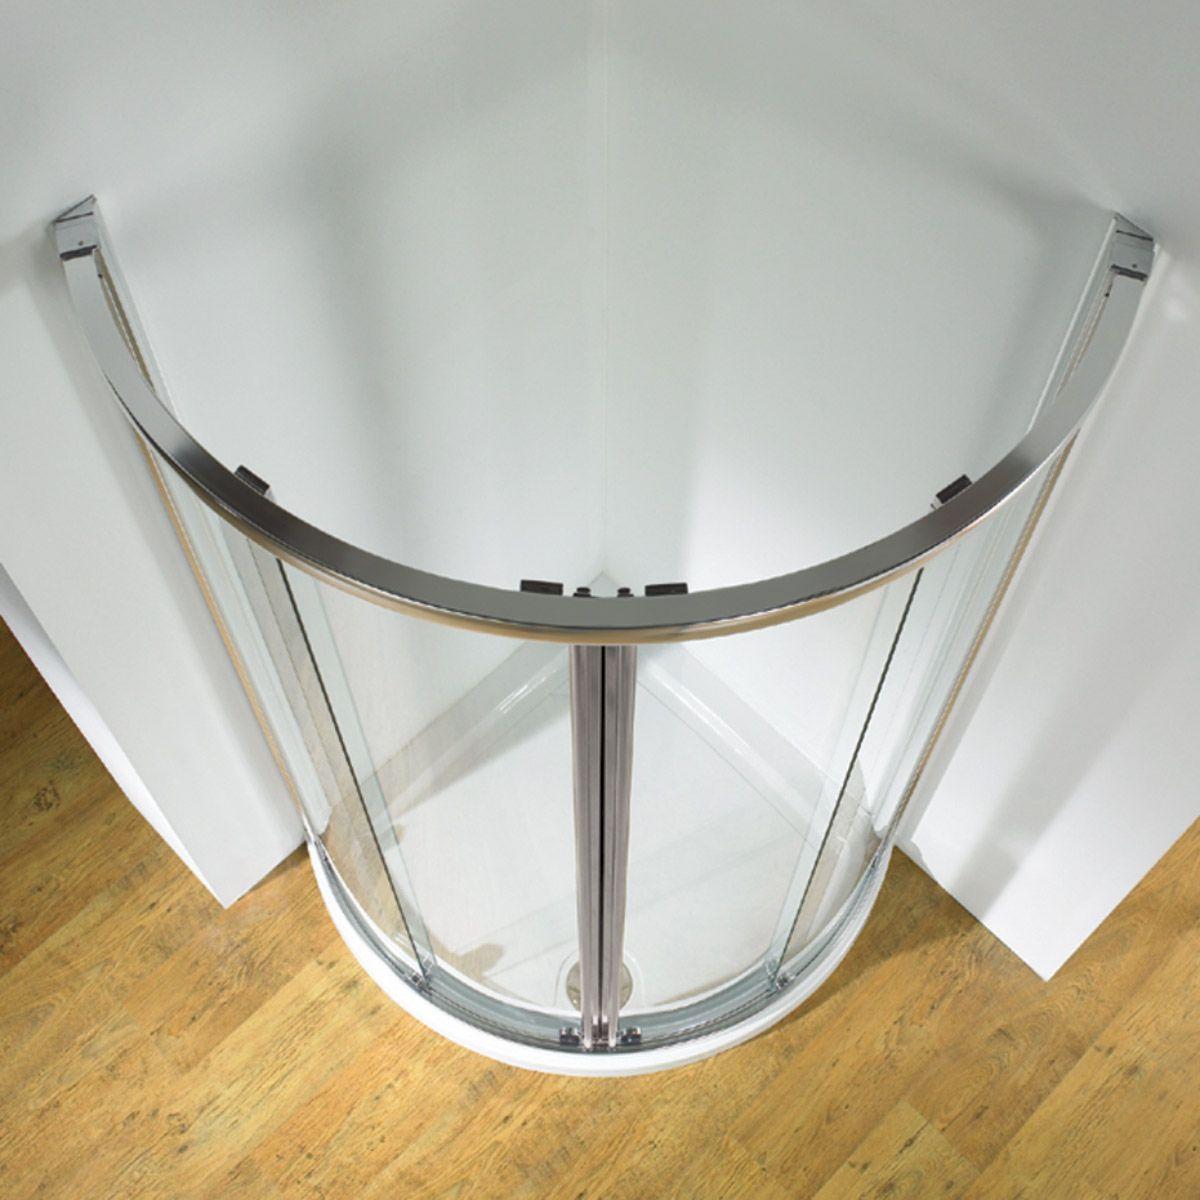 kudosoriginalcurvedslidingenclosure